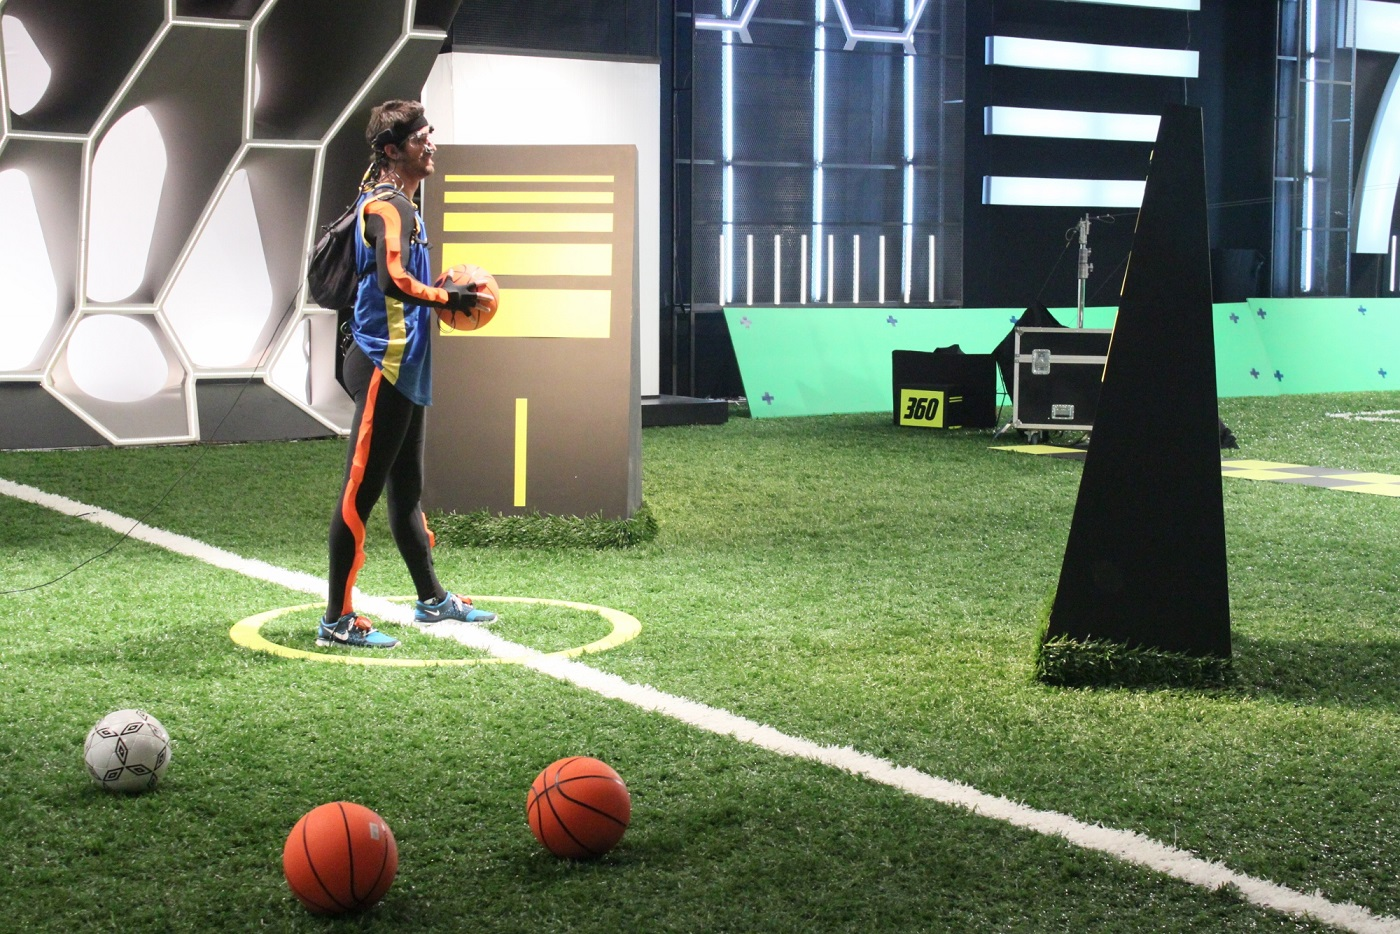 Fotbal - 360 de grade (4)